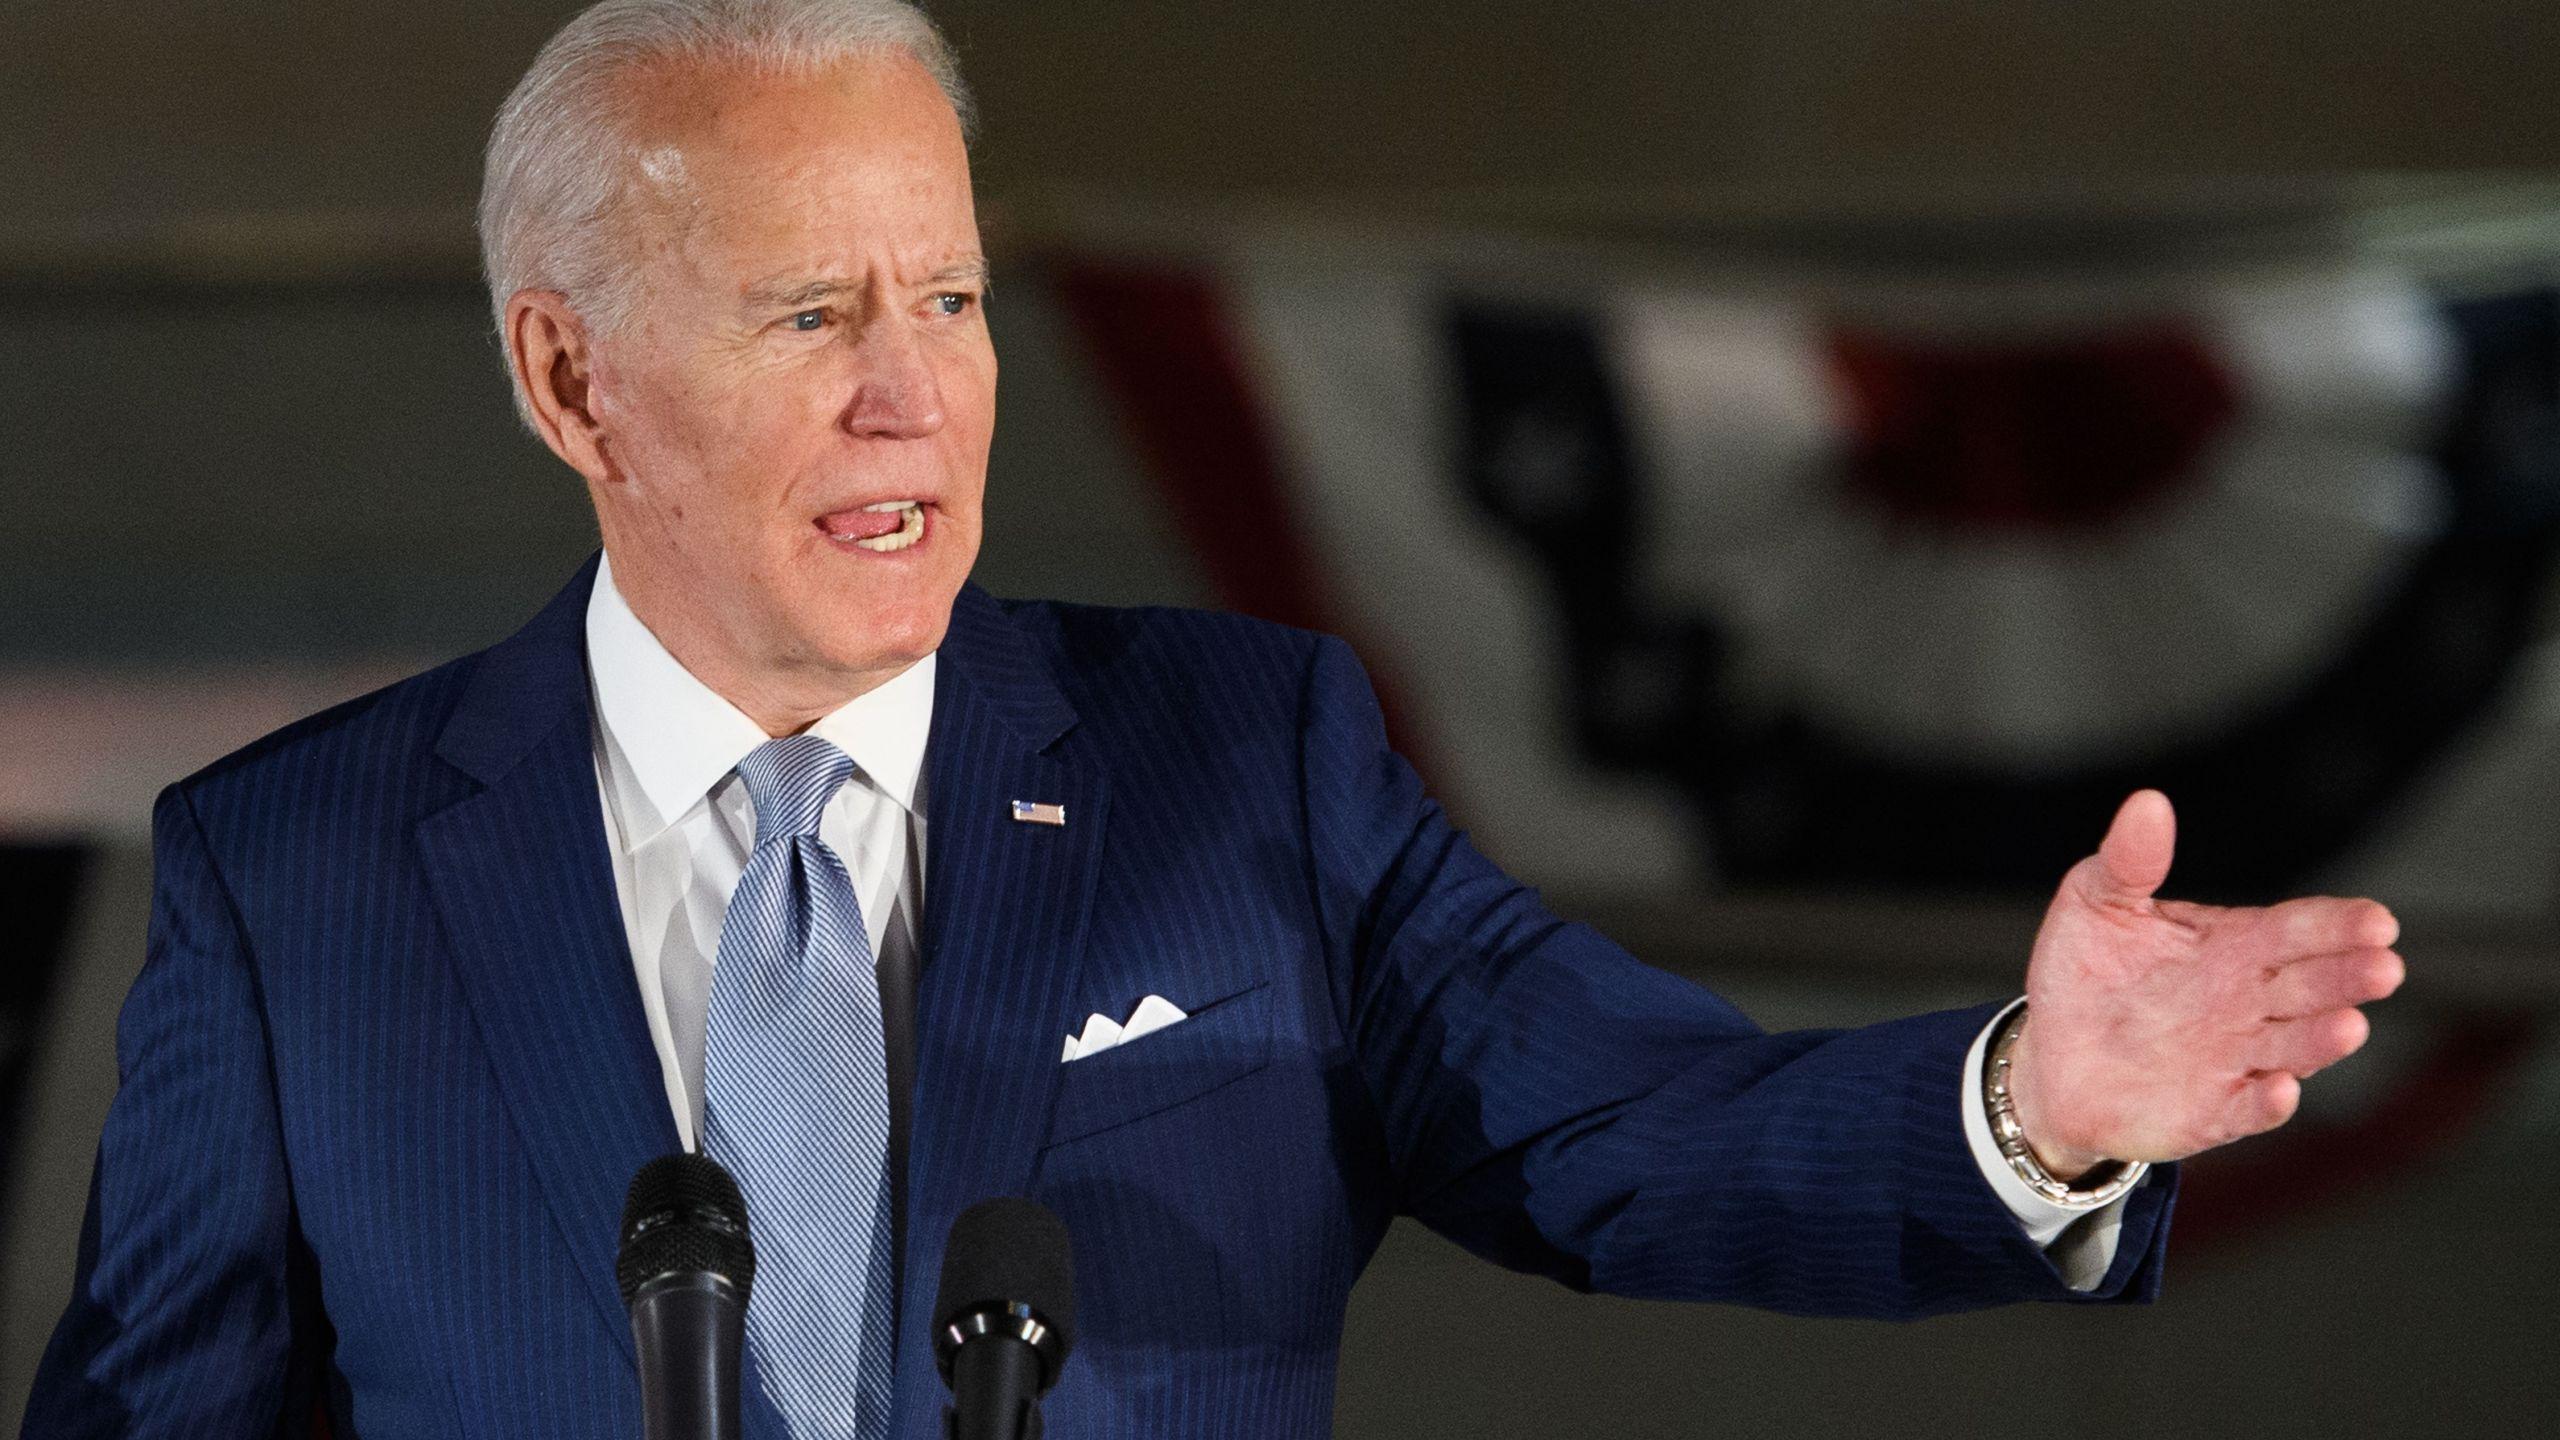 Democratic presidential hopeful former Vice President Joe Biden speaks at the National Constitution Center in Philadelphia, Pennsylvania on March 10, 2020. (MANDEL NGAN/AFP via Getty Images)